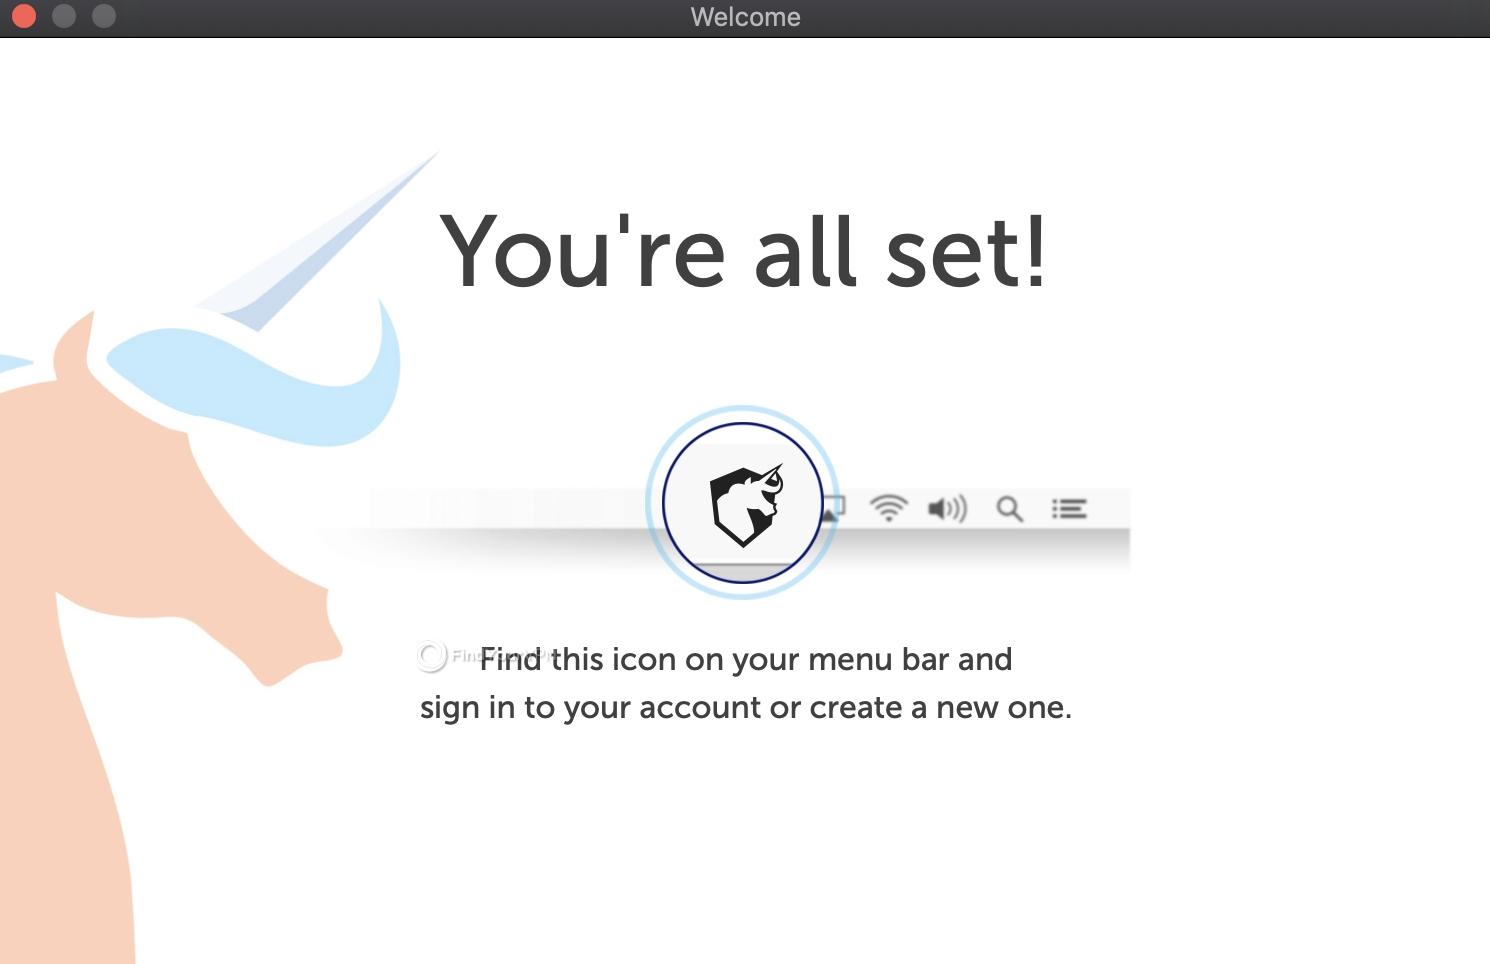 The splash screen of Namecheap macOS app